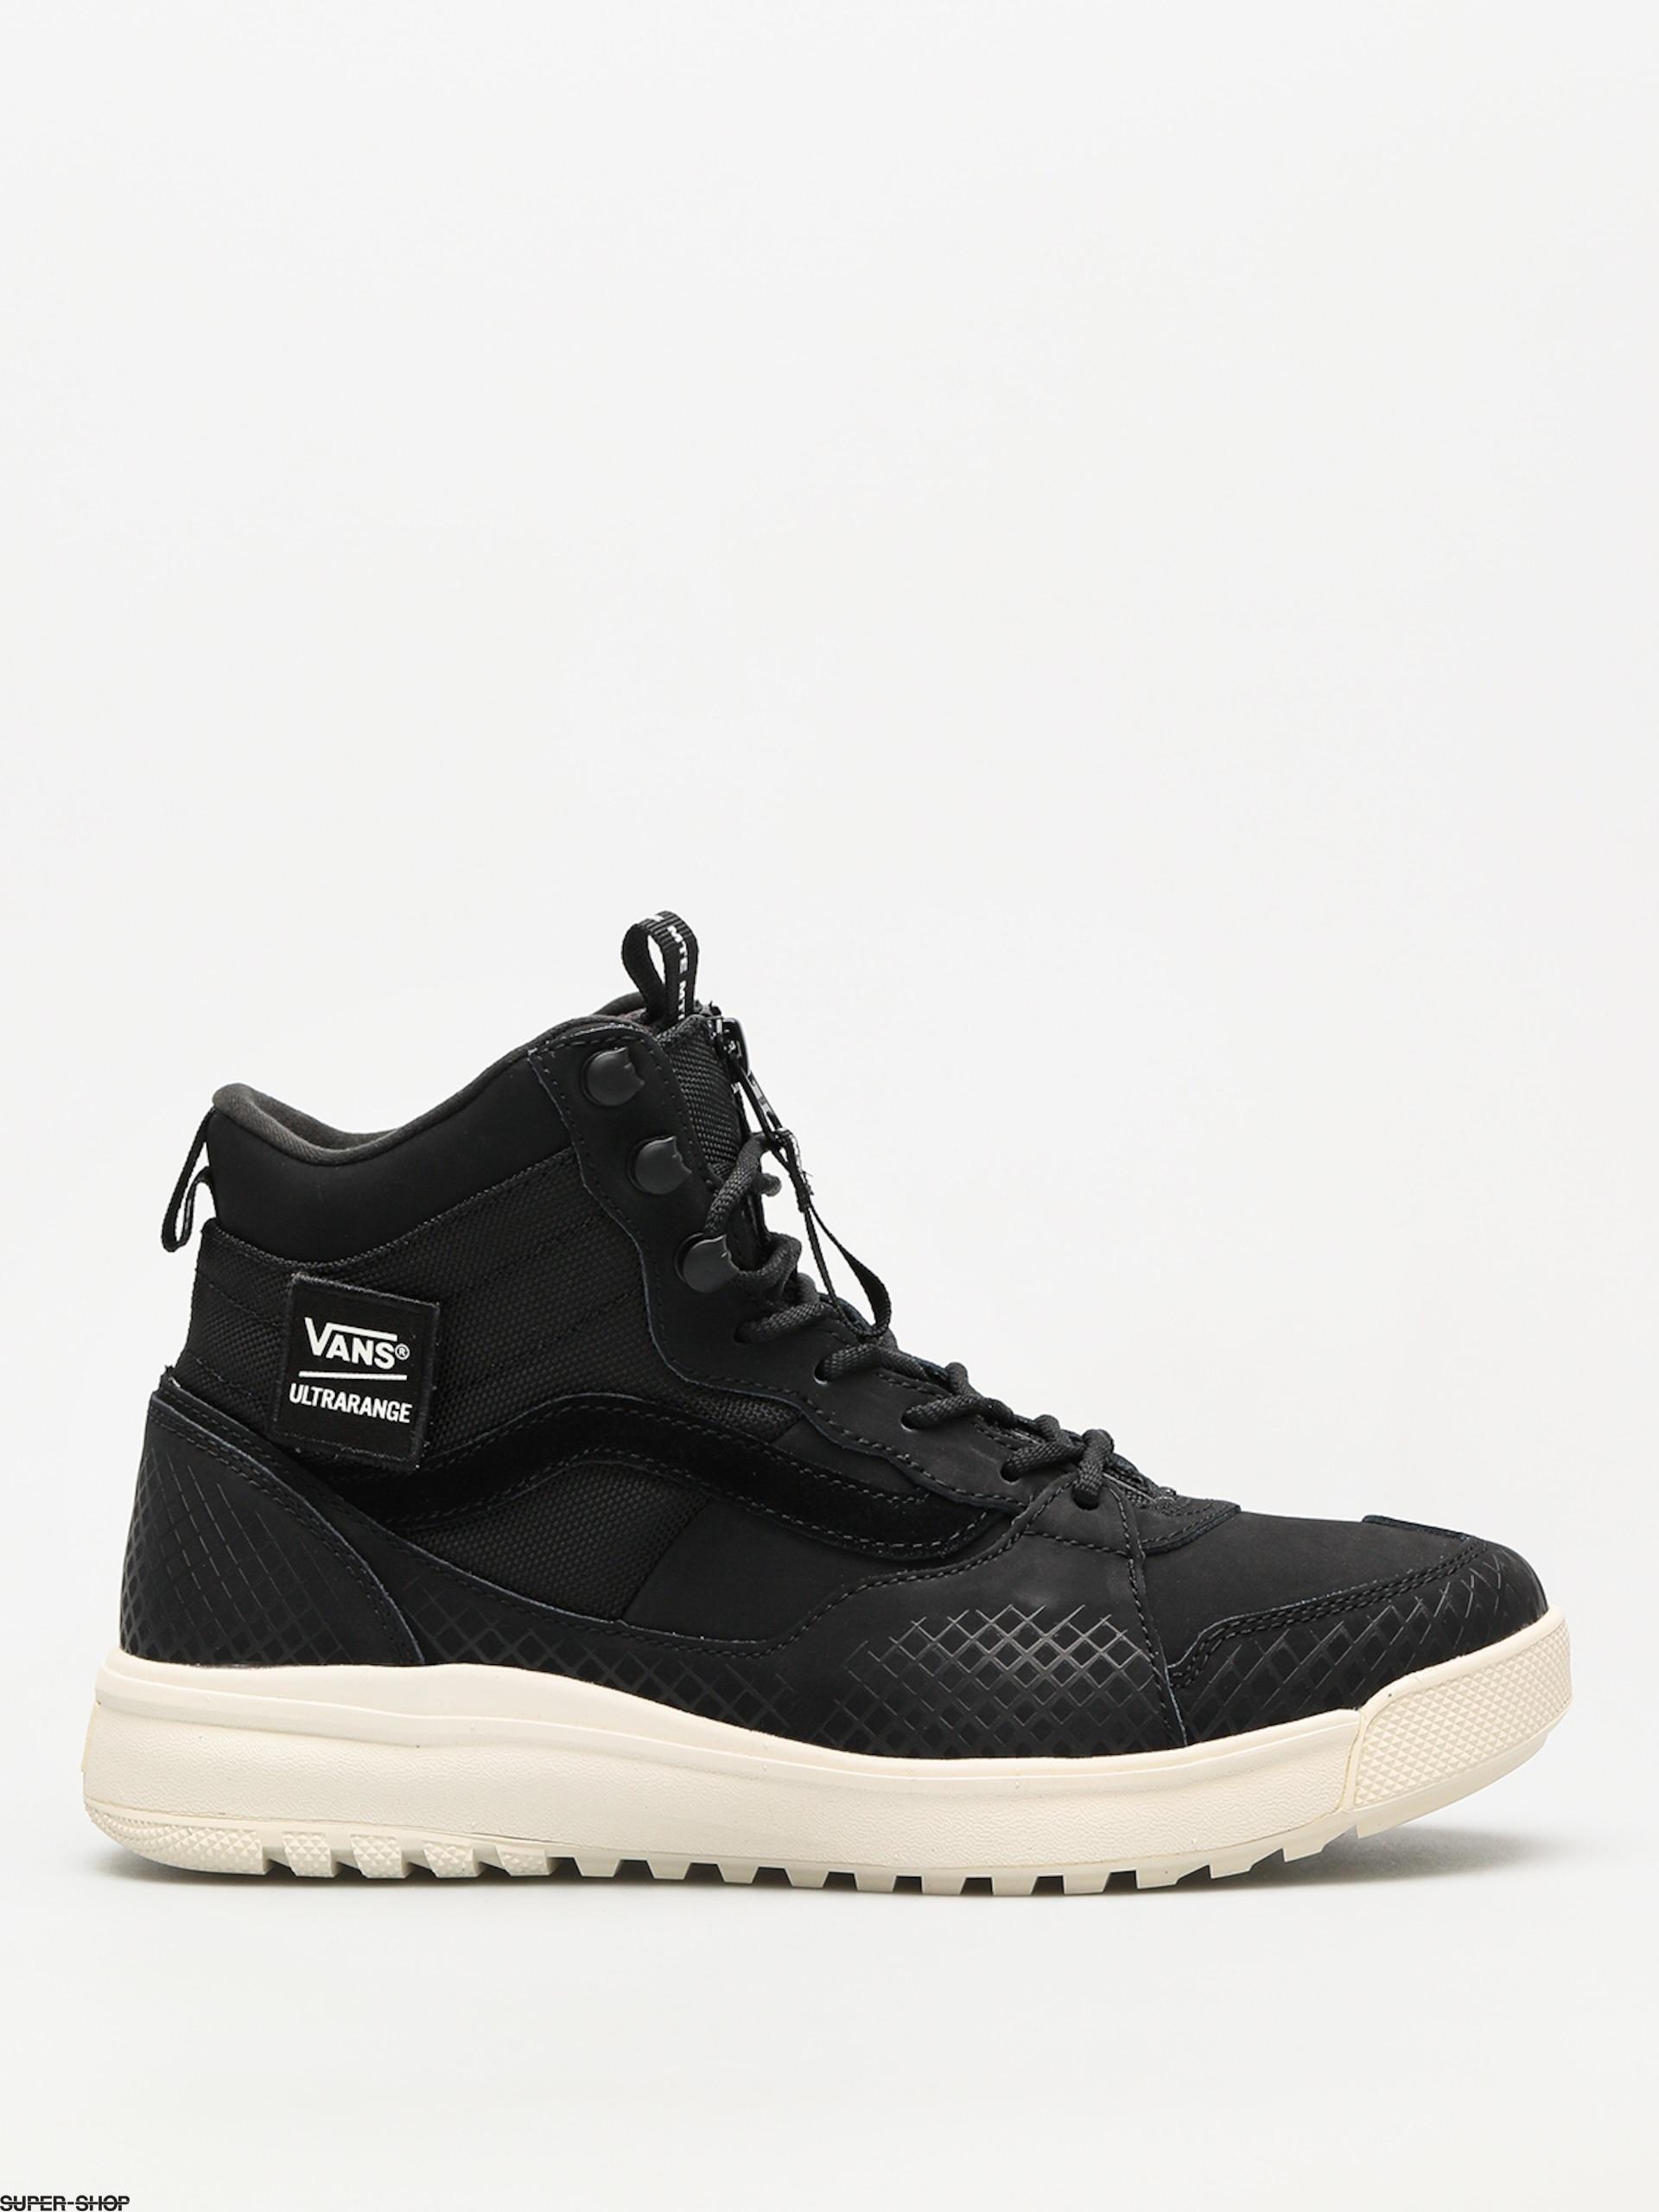 52d4c9bae0c Vans Shoes Ultrarange Hi Dx Zpr Mte (black marshmallow)